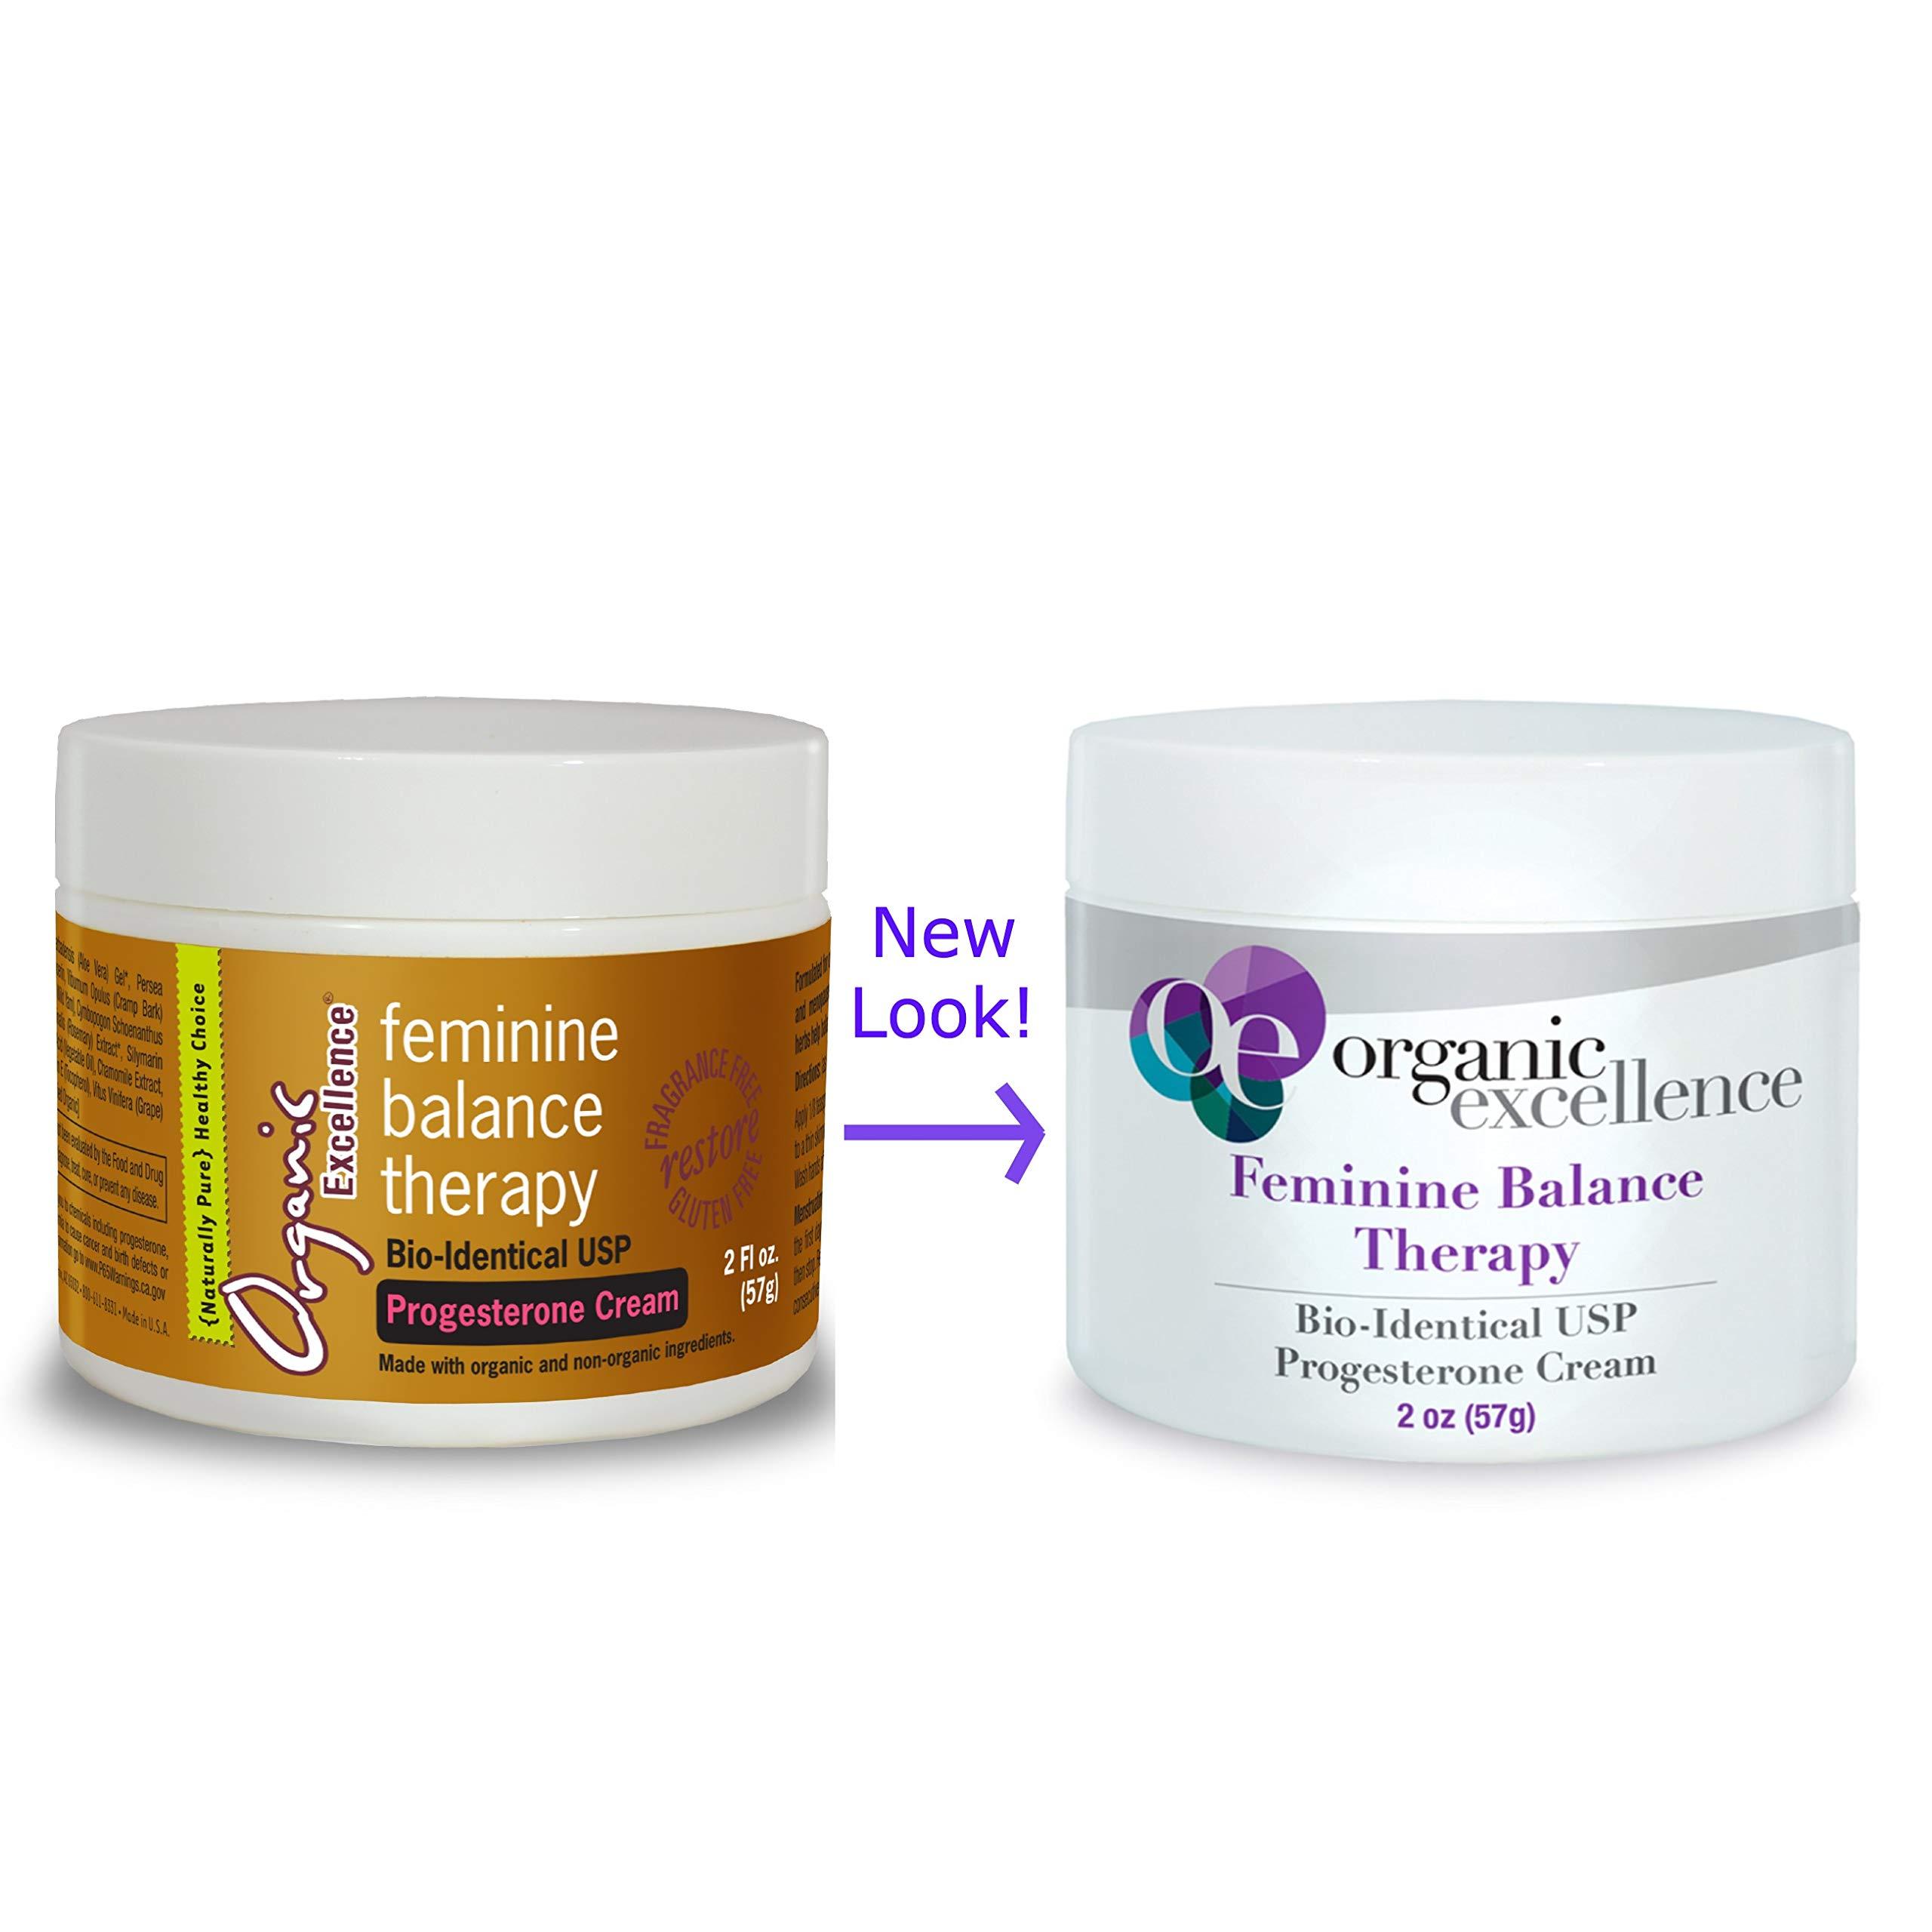 Organic Excellence Feminine Balance Therapy Progesterone Cream - 2 oz / 57g Jar - Bio-Identical USP, Balancing Formula for Hormonal Imbalance, PMS, Perimenopause, Menopause